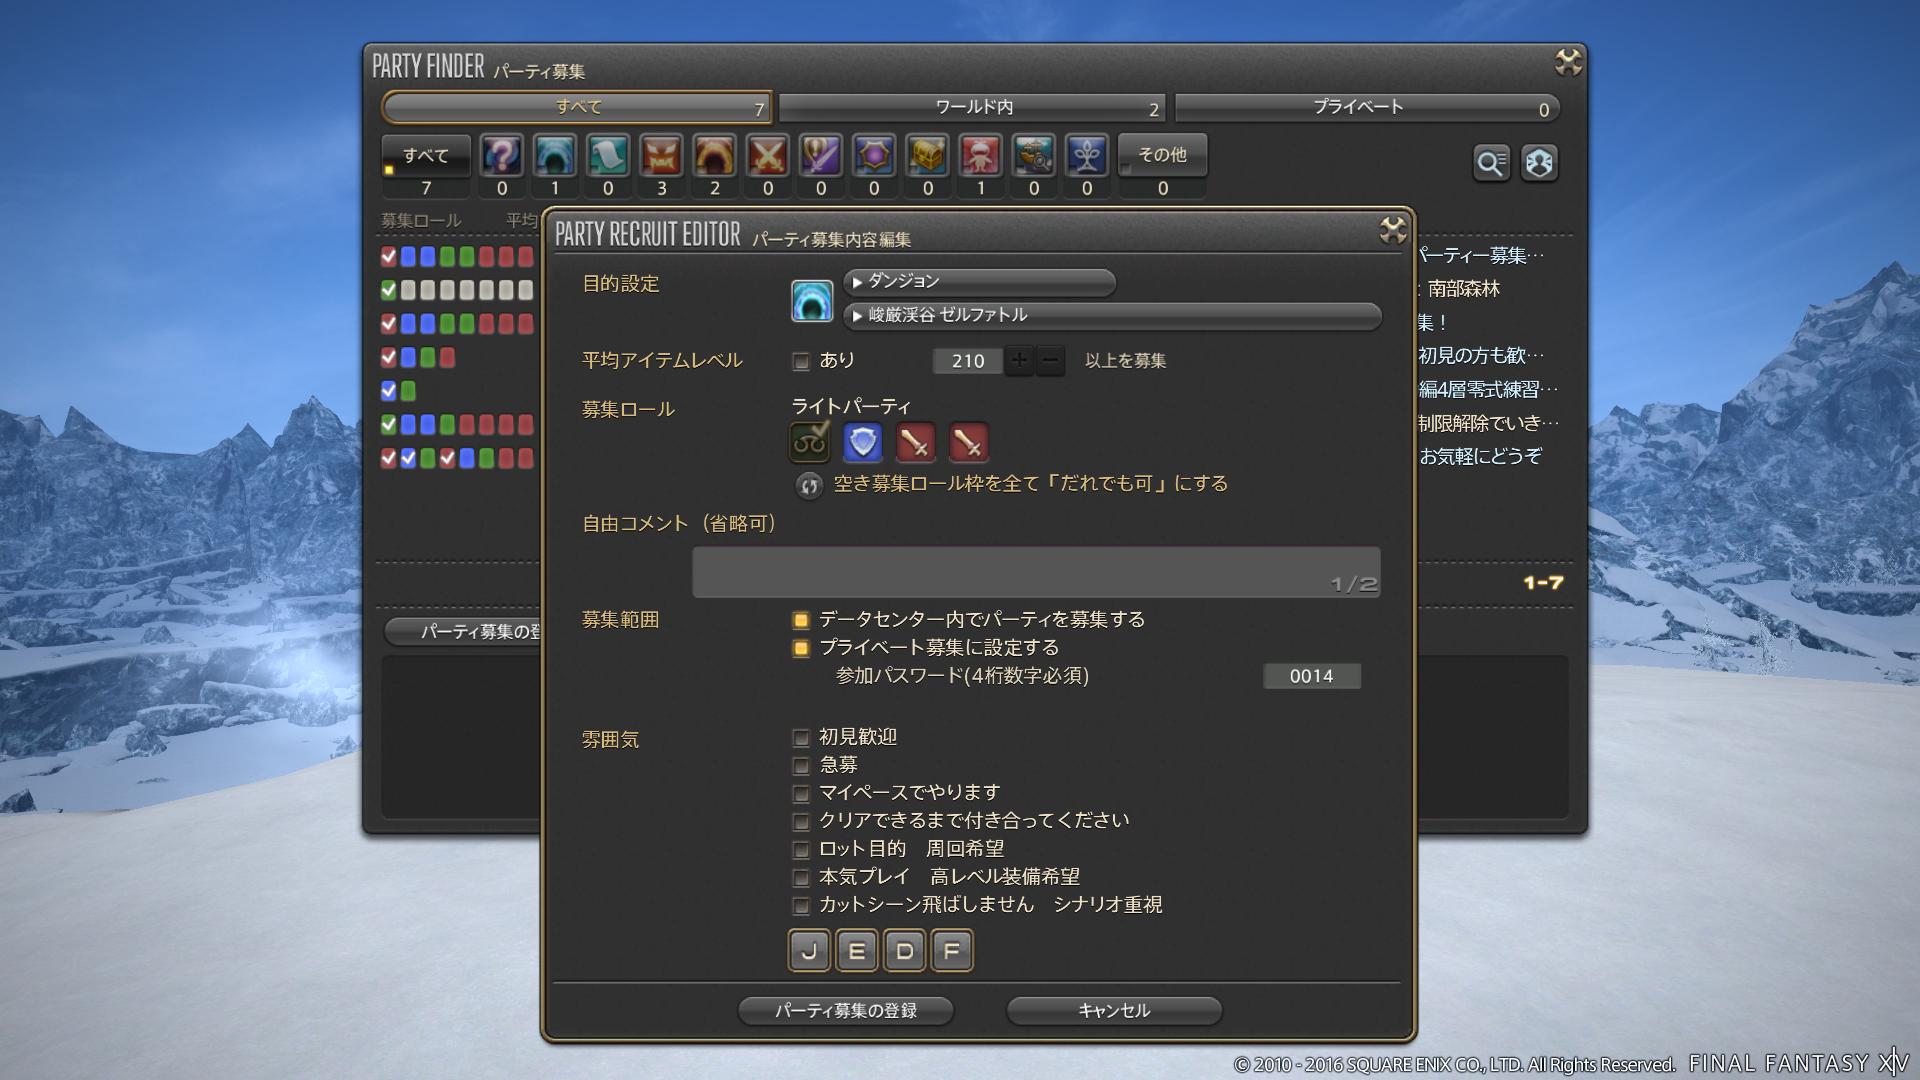 ffxiv_screenshot_partyfinder02_patch3_1482252818-5_20-12-2016-png